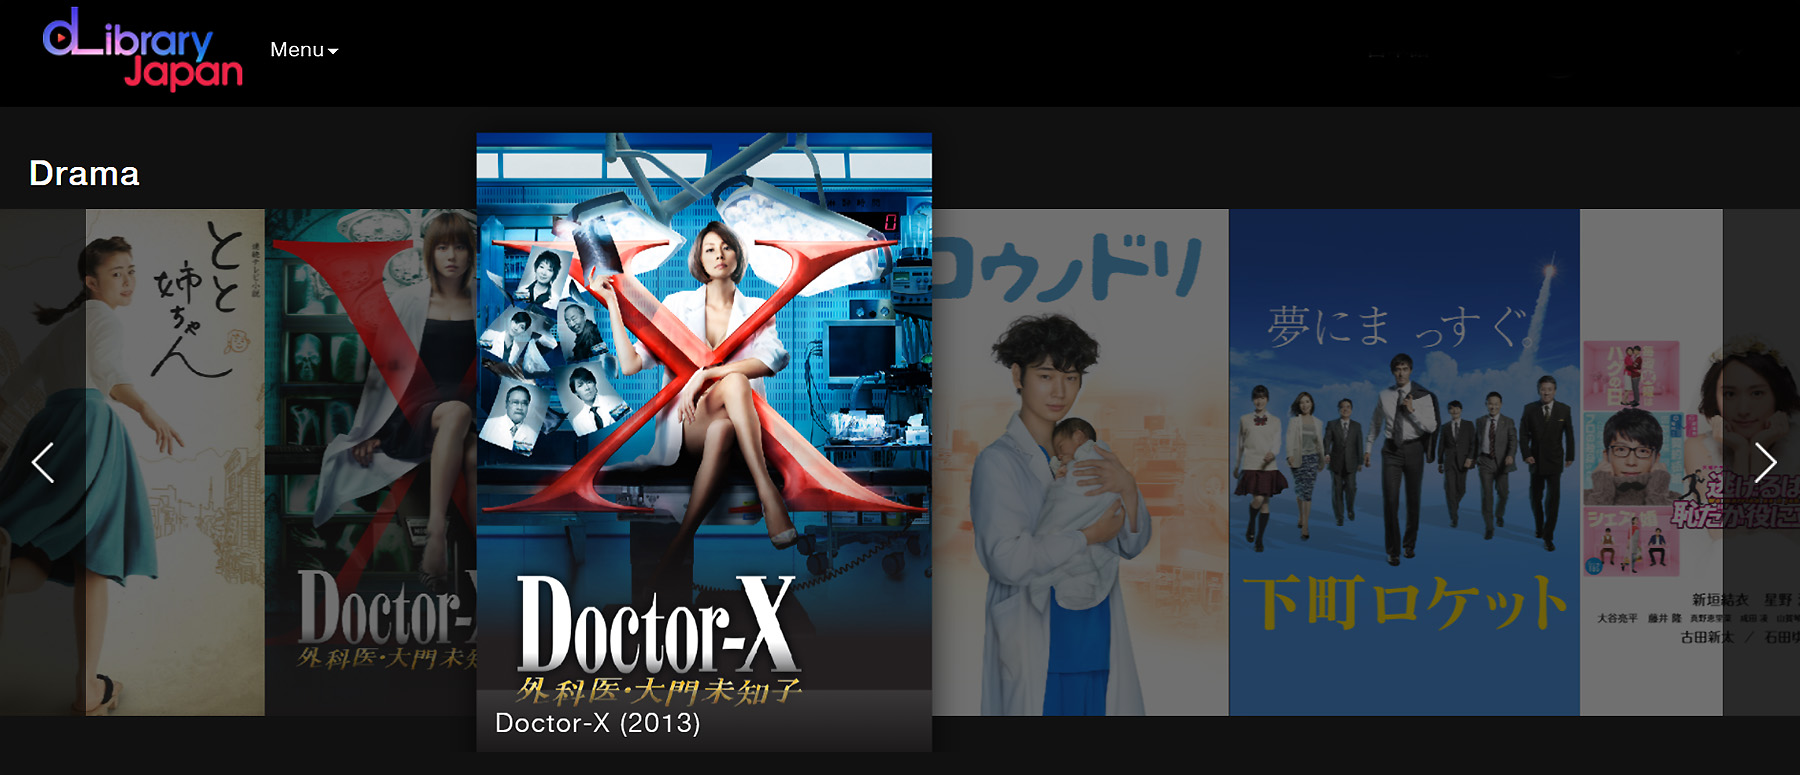 Drama-MAX-dLibrary-Japan-intro-2018-1